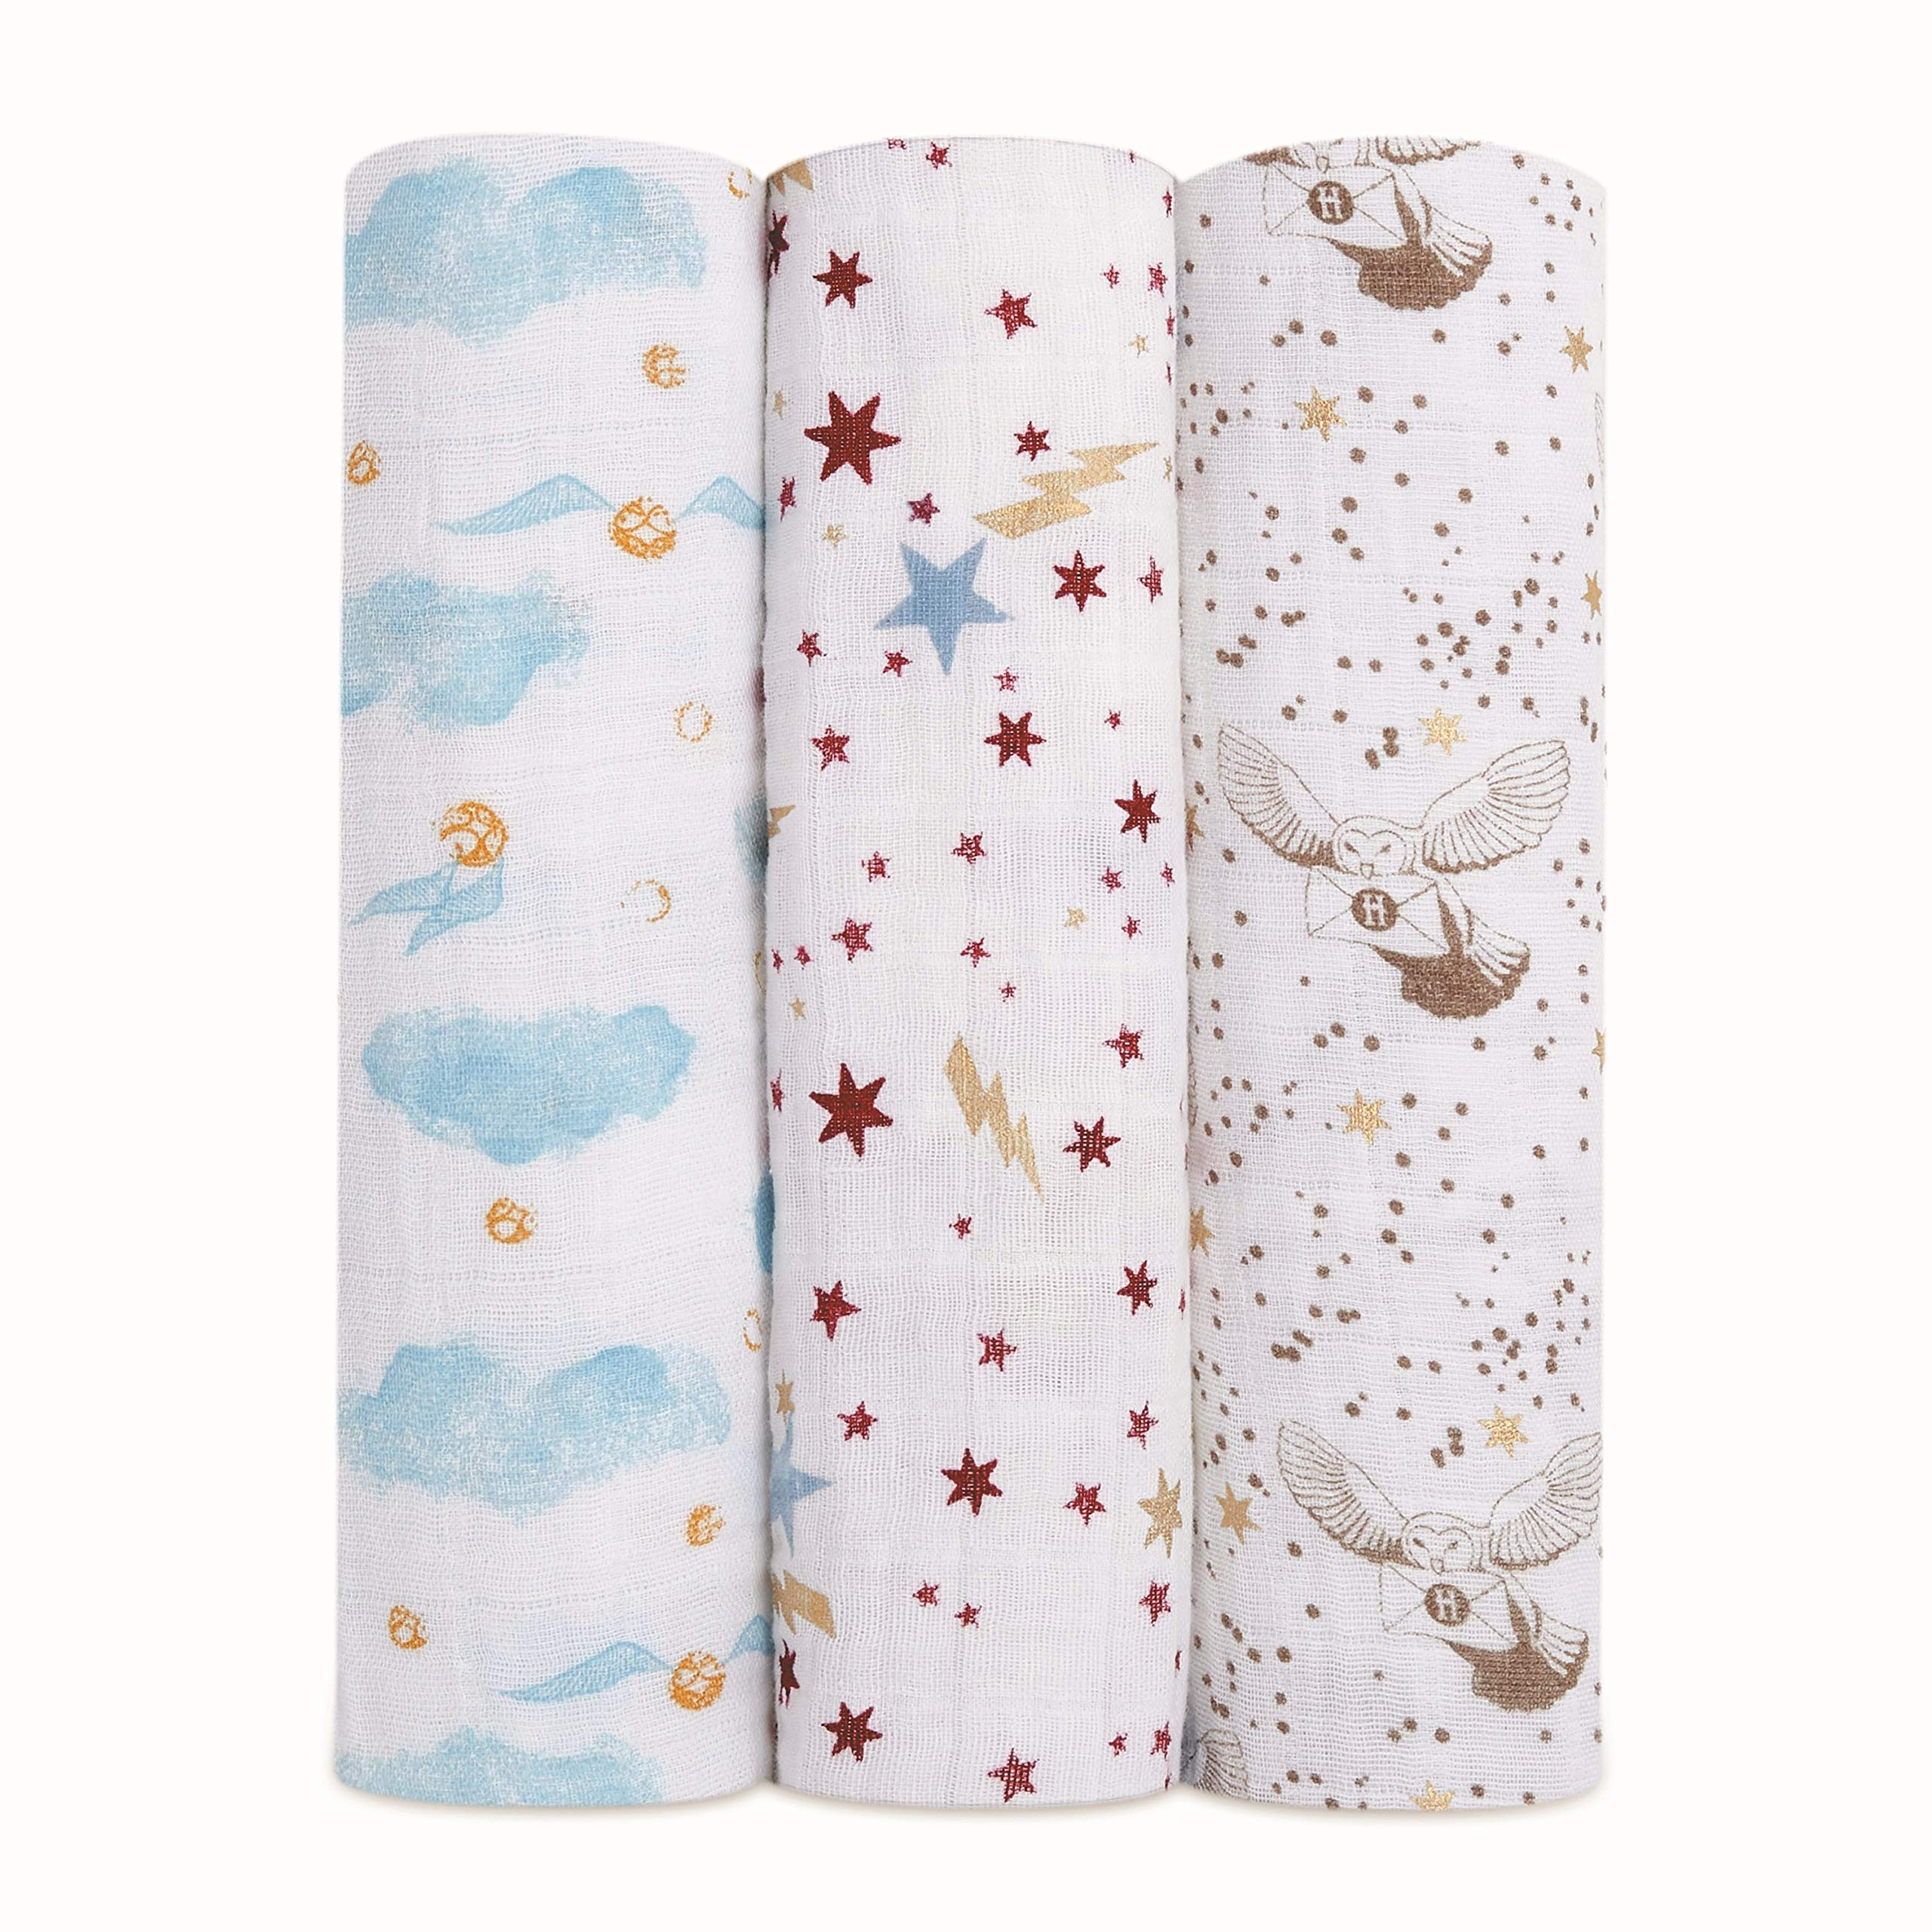 aden + anais Harry Potter Baby Swaddle Blanket Metallic Muslin Blankets for Girls & Boys Receiving Blanket, Newborn Nursery Gifts, Unisex Infant & Toddler Shower Items, Swaddling 3 Pack, Hogwarts